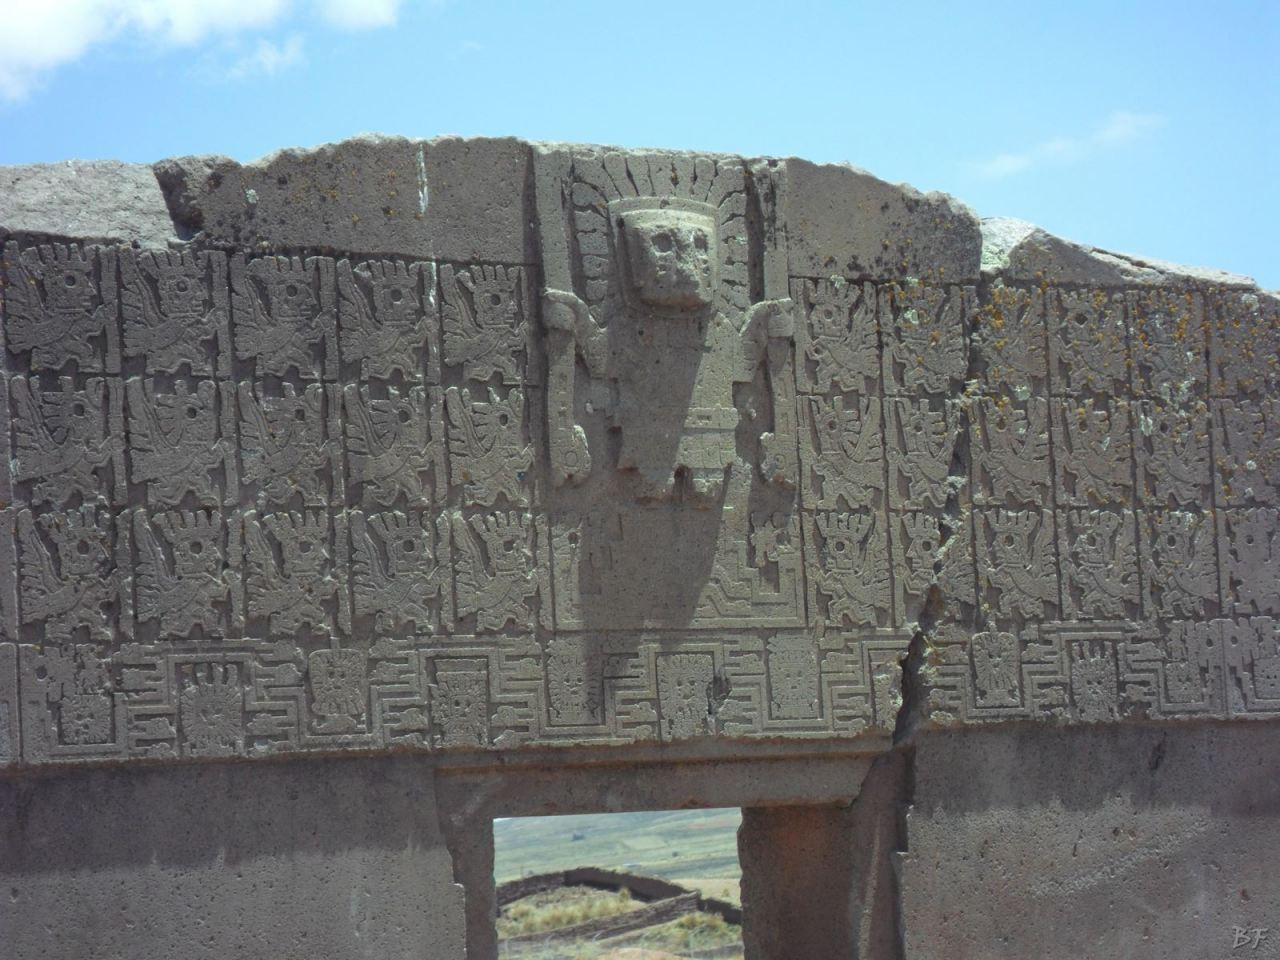 Sito-Megalitico-Piramide-Akapana-Kalasasaya-Menhir-Tiahuanaco-Bolivia-24